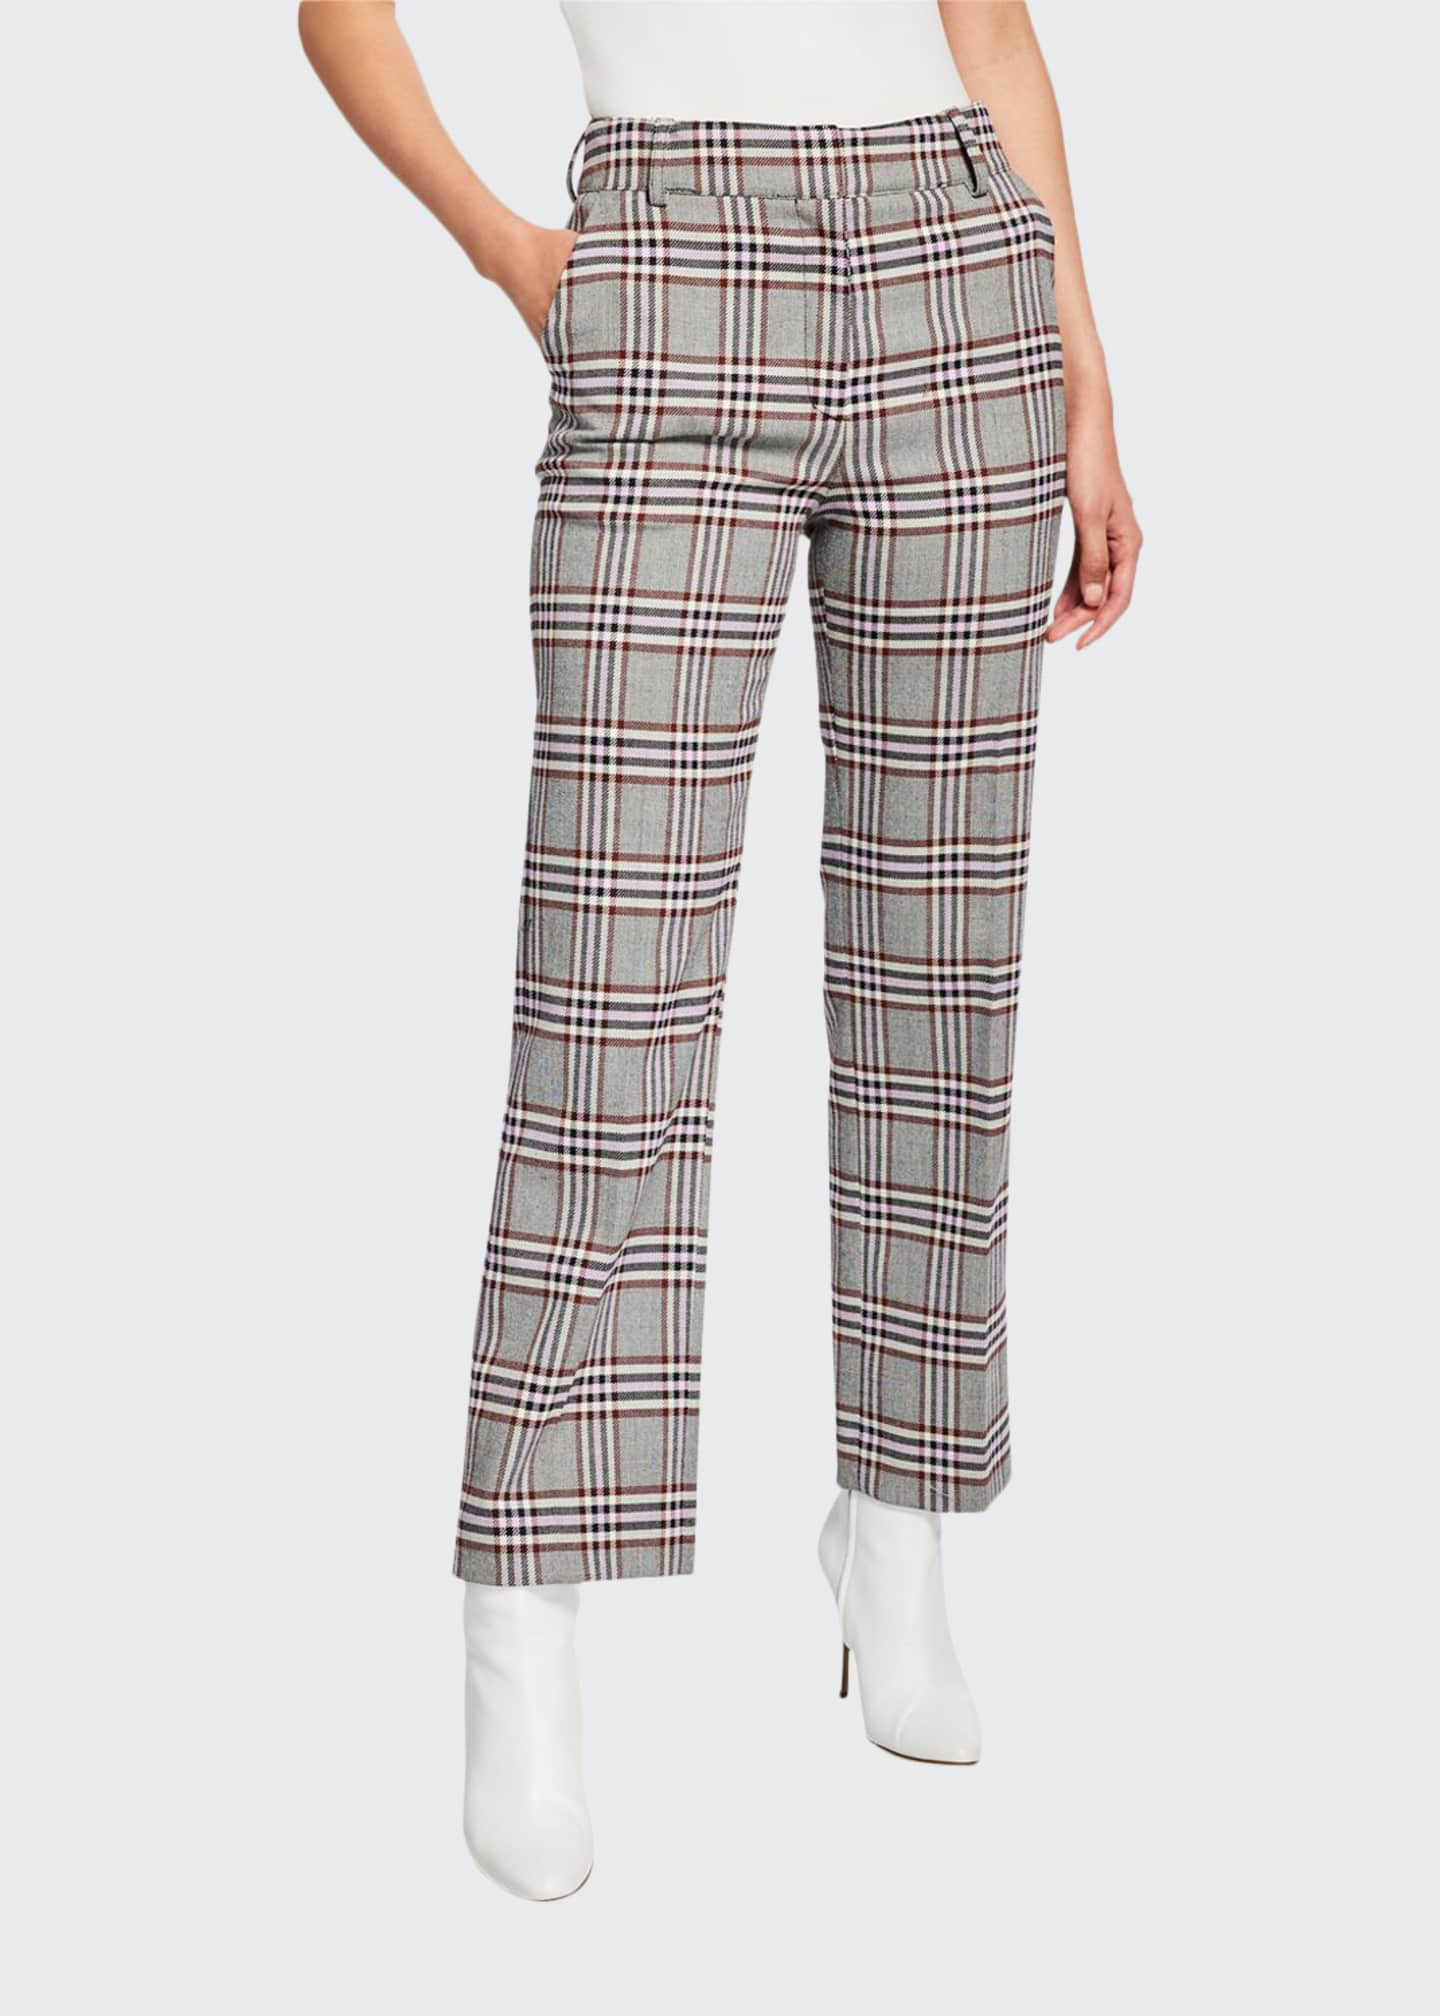 Derek Lam 10 Crosby Straight-Leg Check Trousers